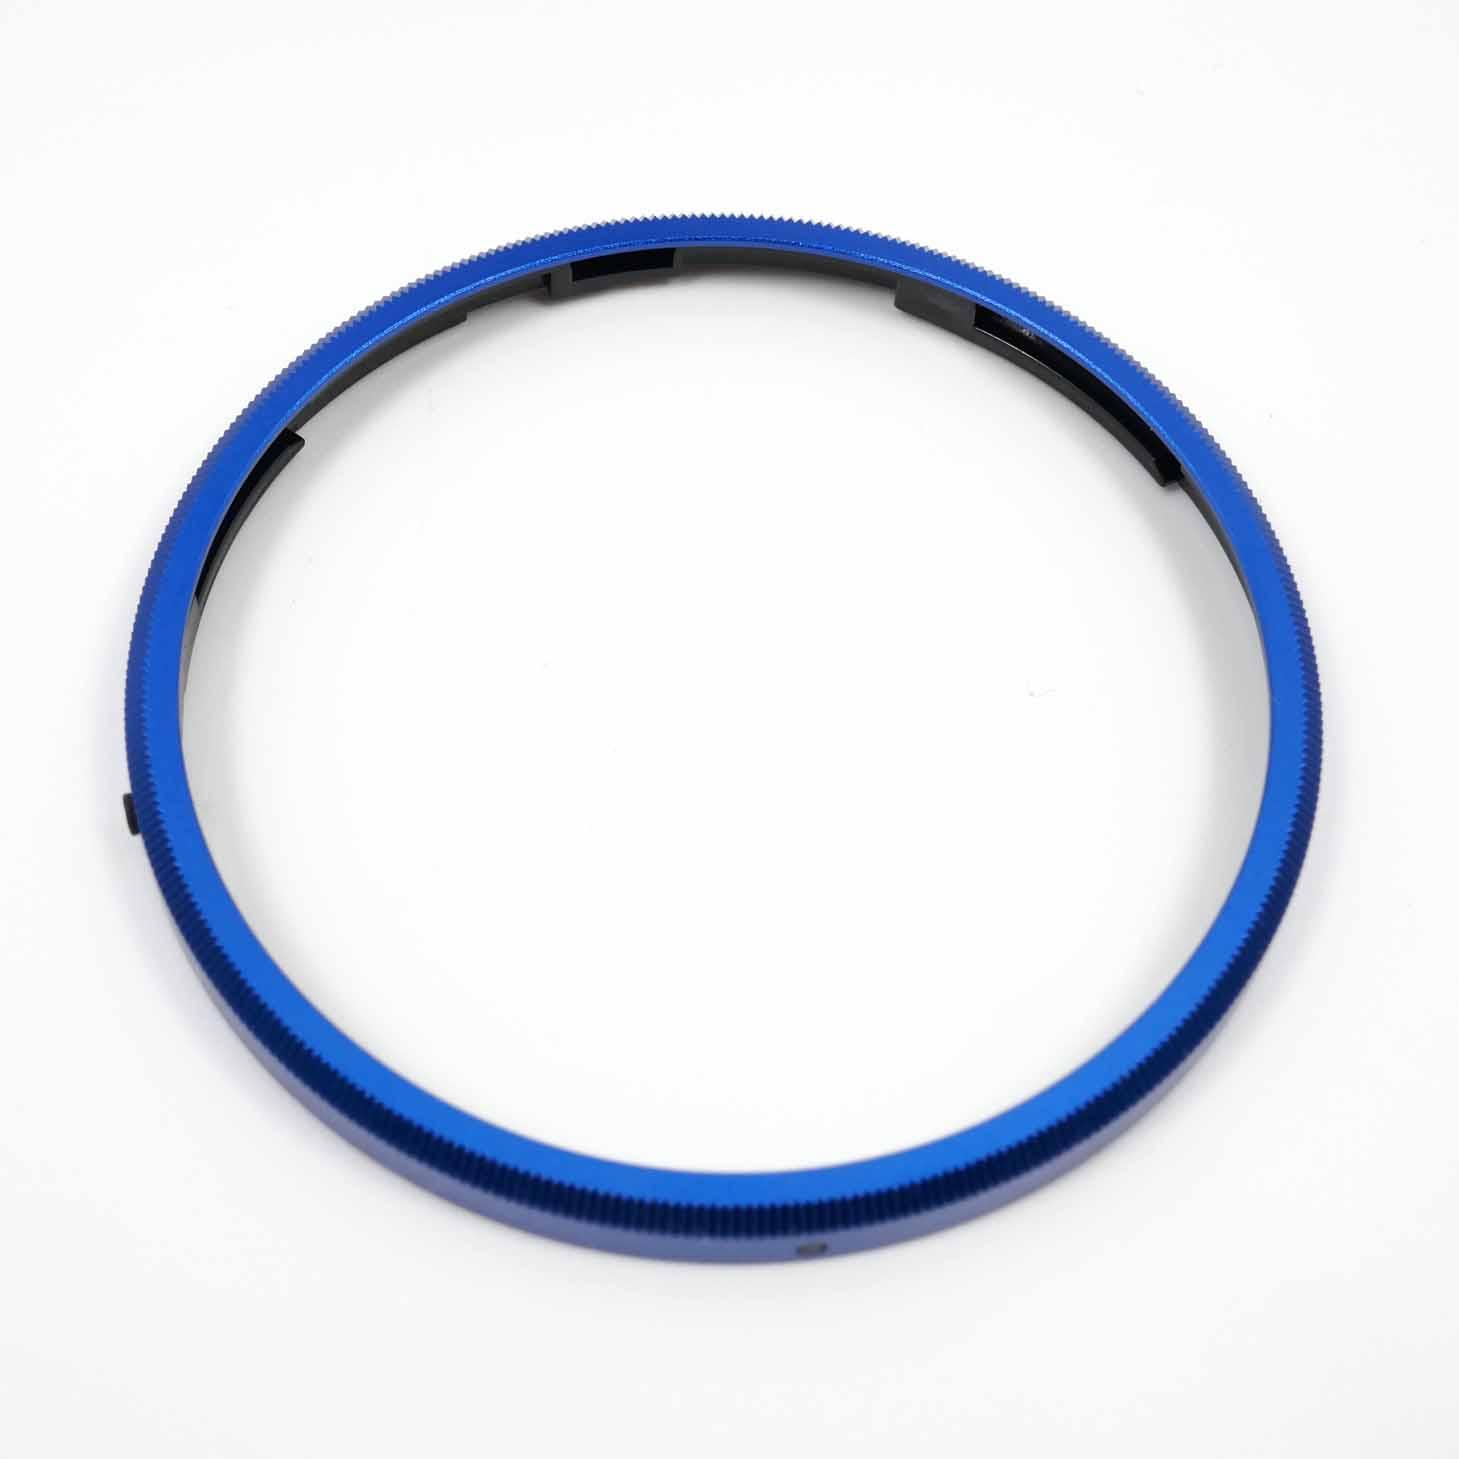 clean-cameras-Ricoh-Ring-Cap-blue-0037824-03